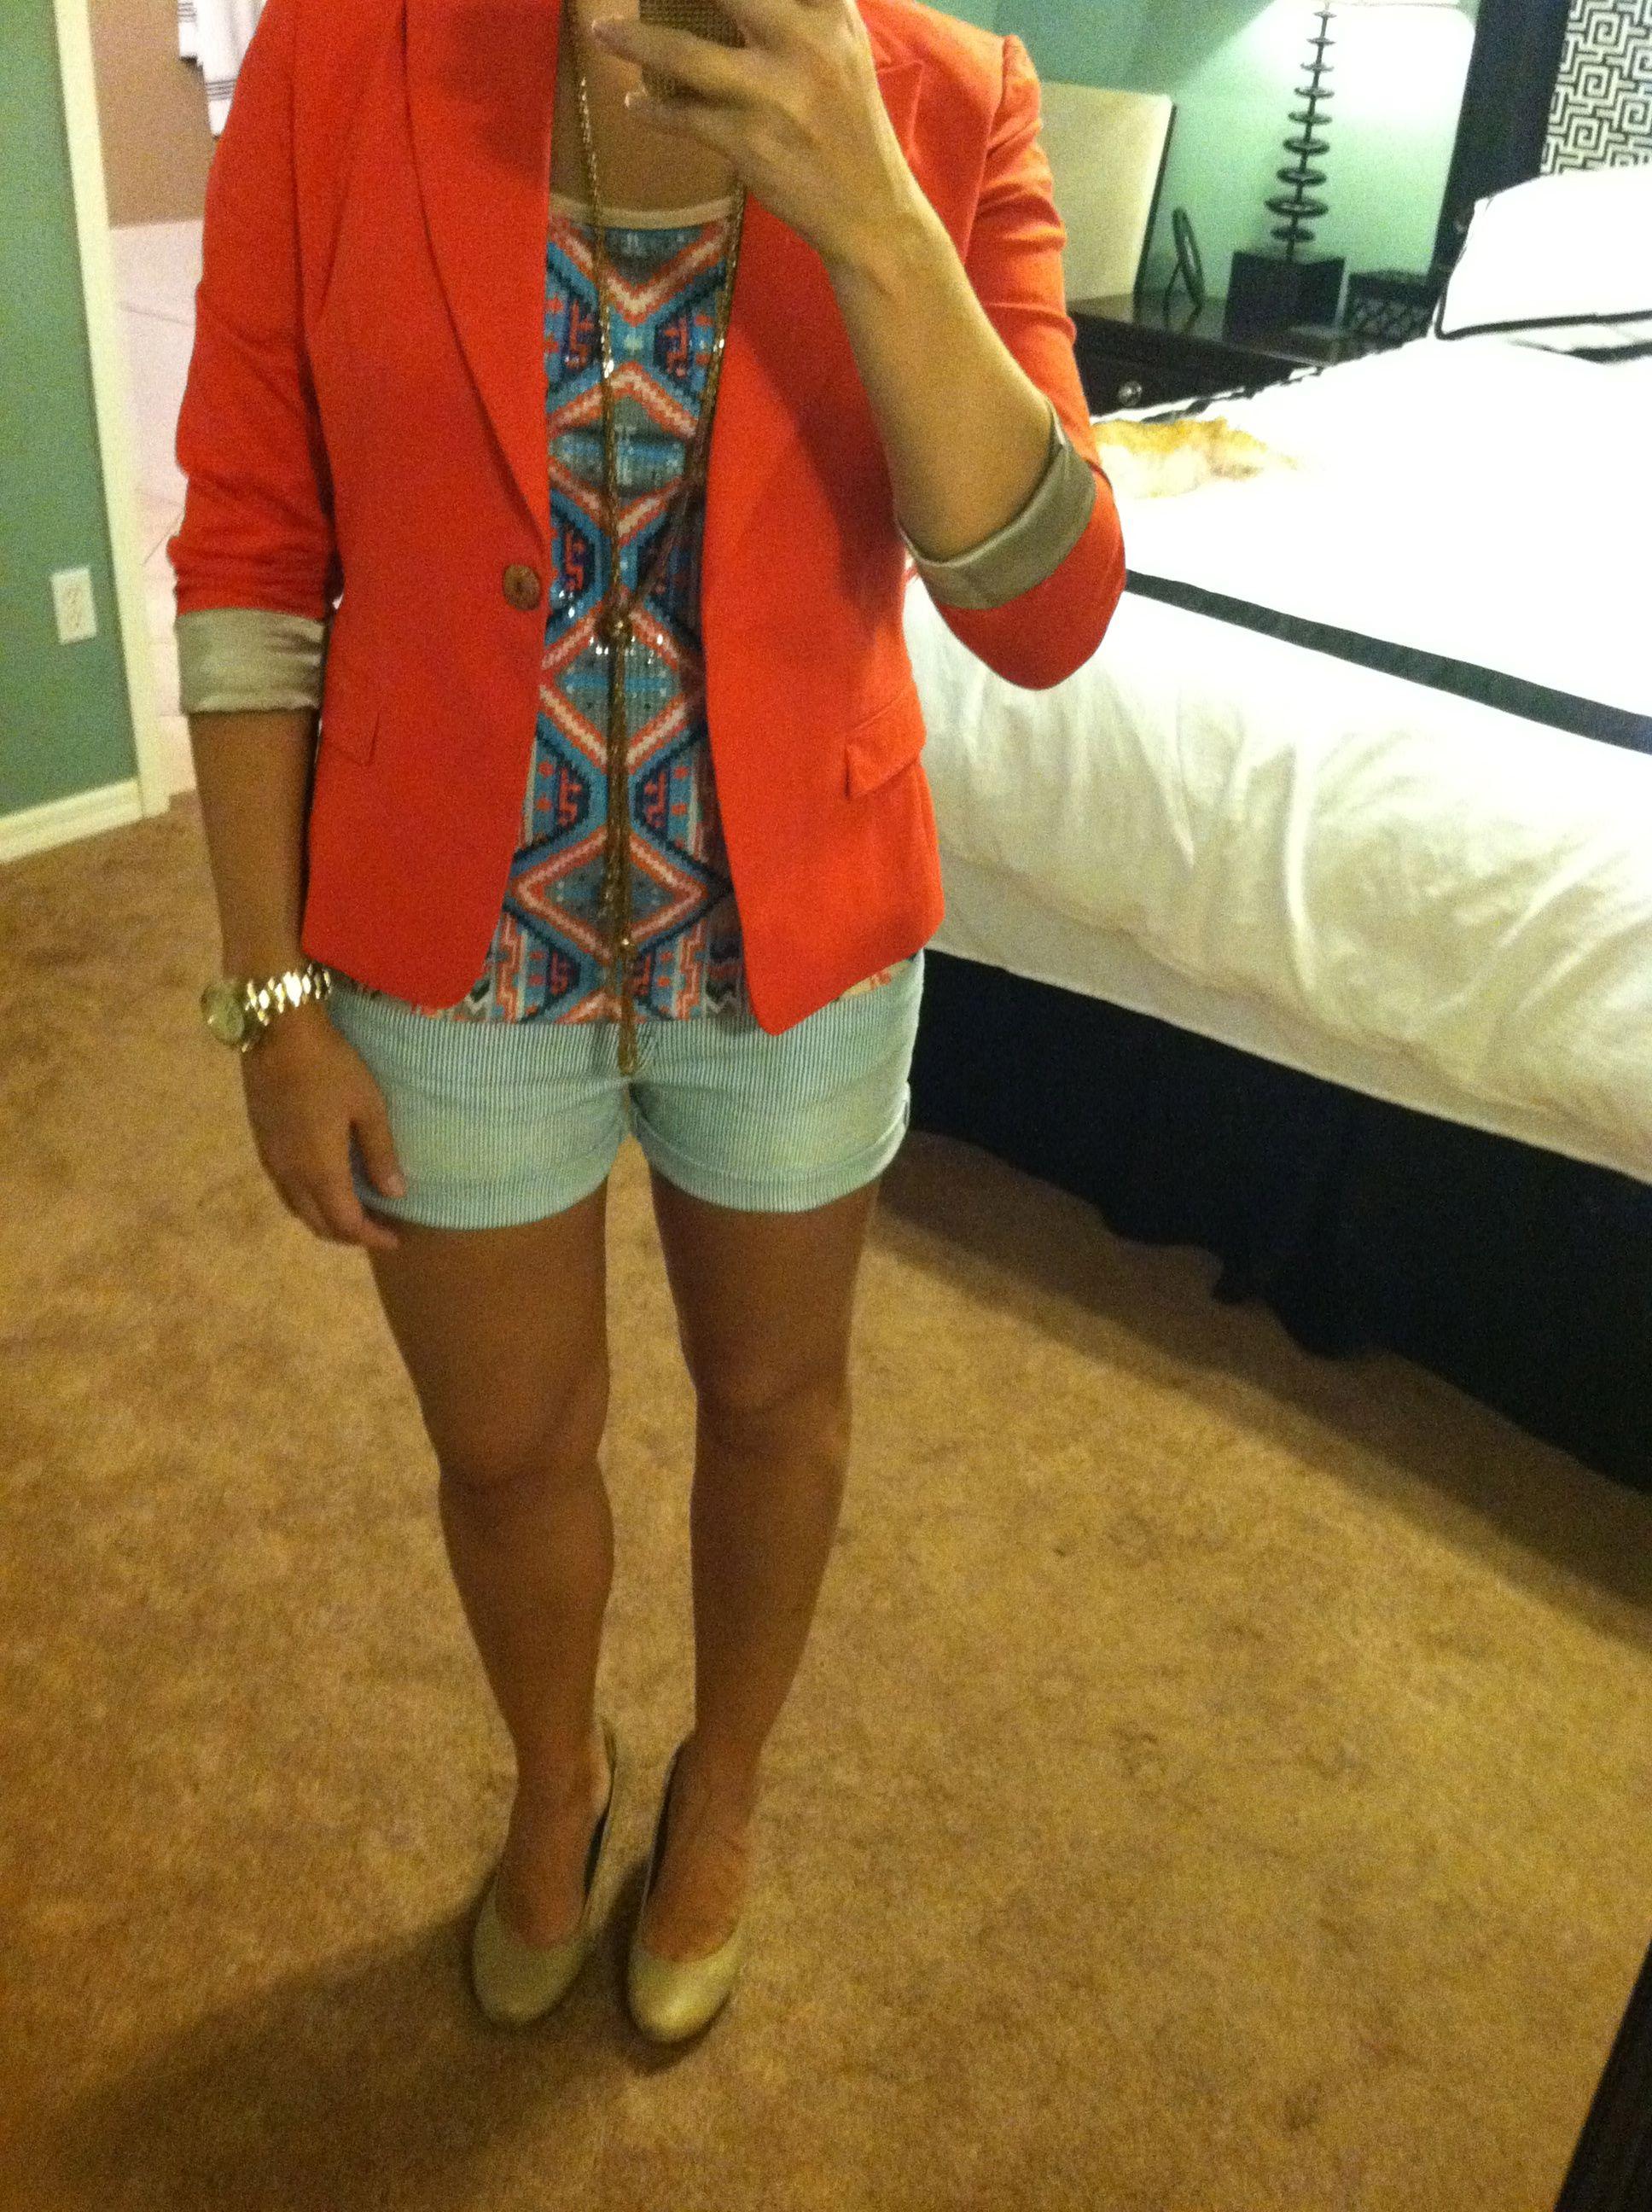 1b7c06a71ce Blazer - Tahari (part of a Tahari suit) Shirt - TJ Maxx Necklace - Vintage  from my Gramma s closet Shorts - Macy s Shoes - Gianni Bini - Dillards